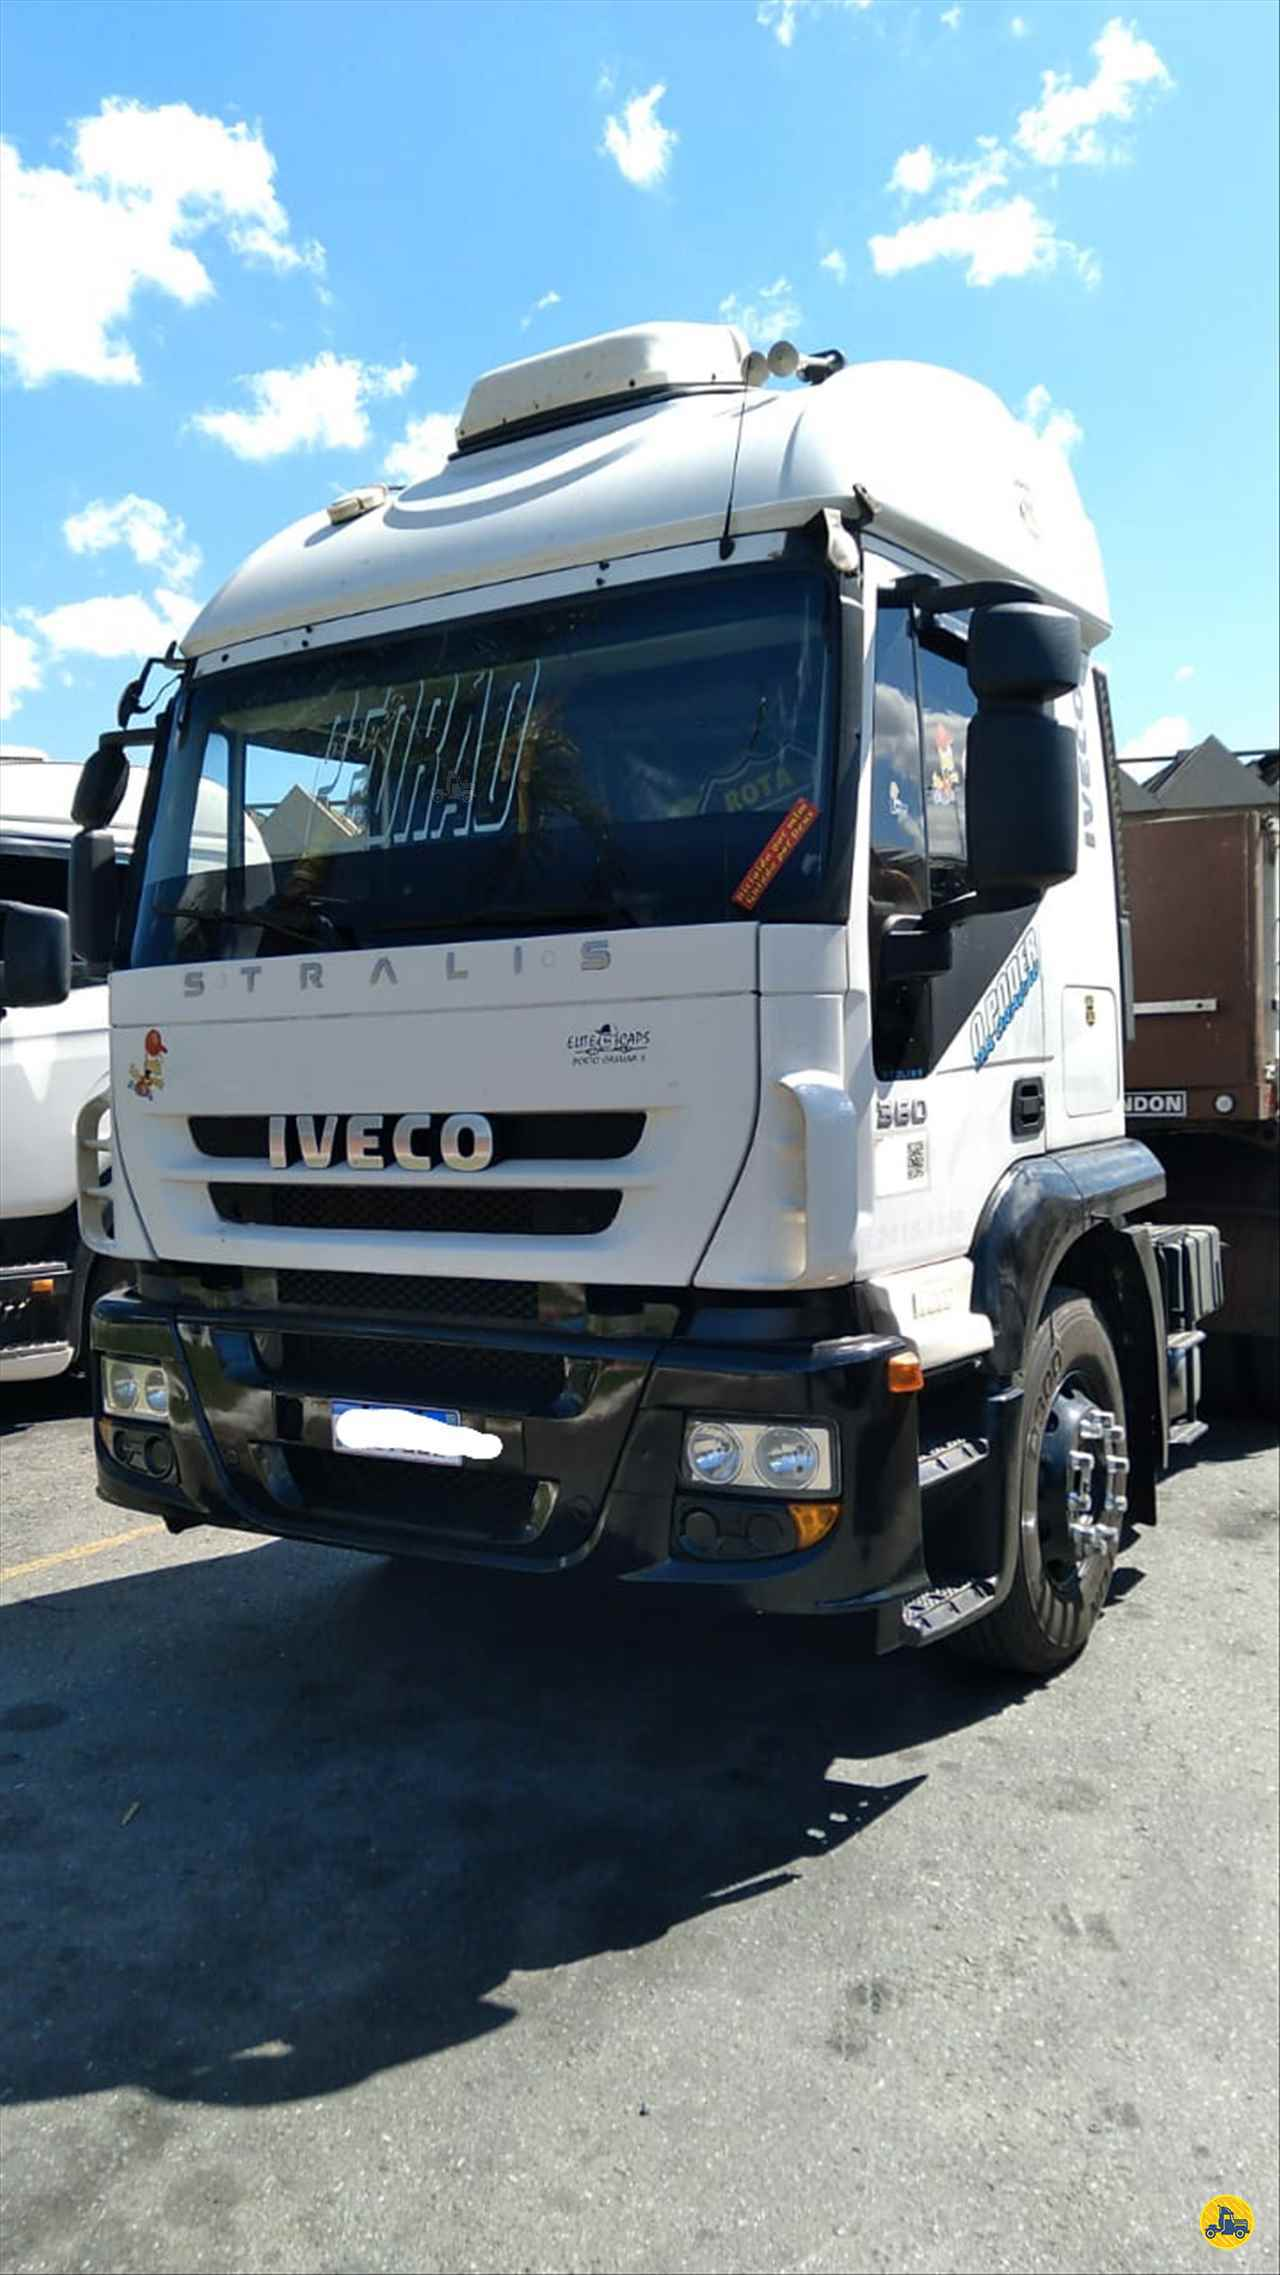 STRALIS 360 de Afranio Caminhões - RIO BONITO/RJ